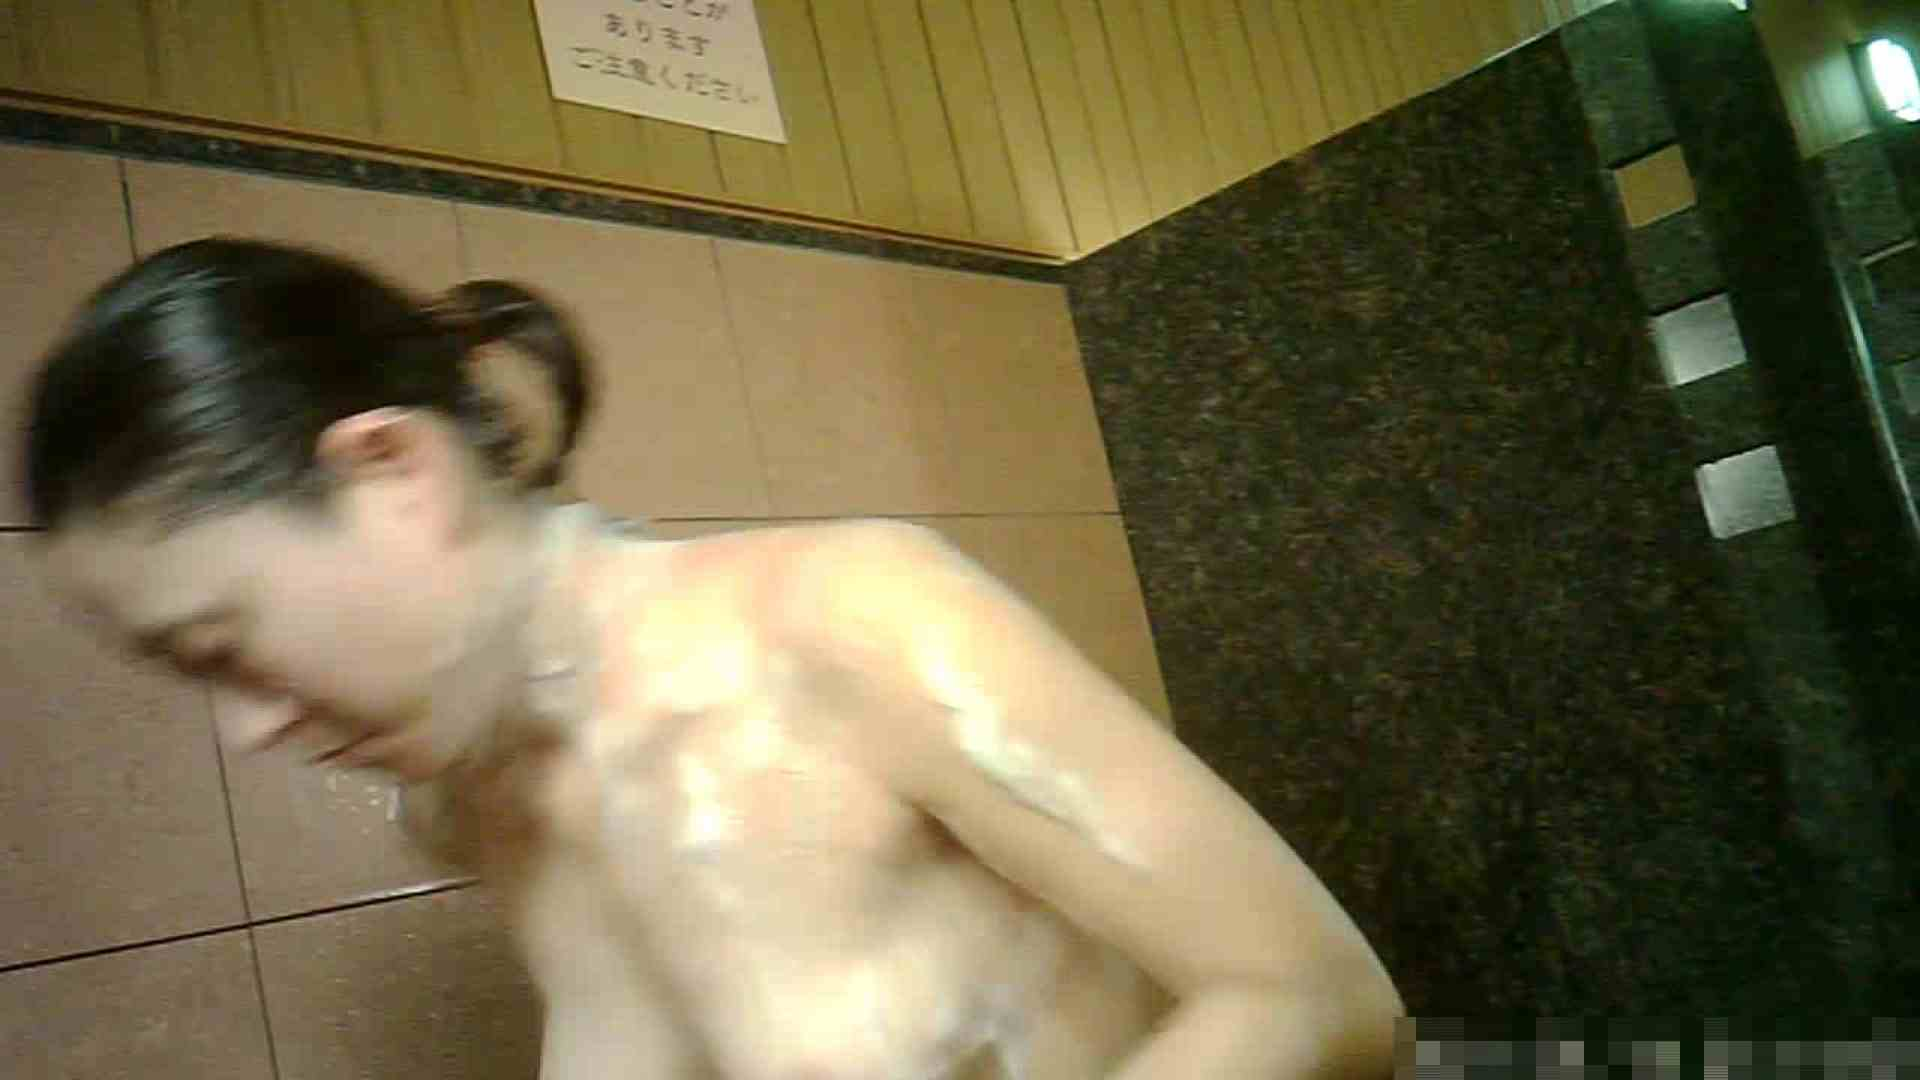 No.1 洗い場!!とっても綺麗な身体のお女市さん、乳首も綺麗です。 銭湯 | 潜入エロ調査  23連発 18